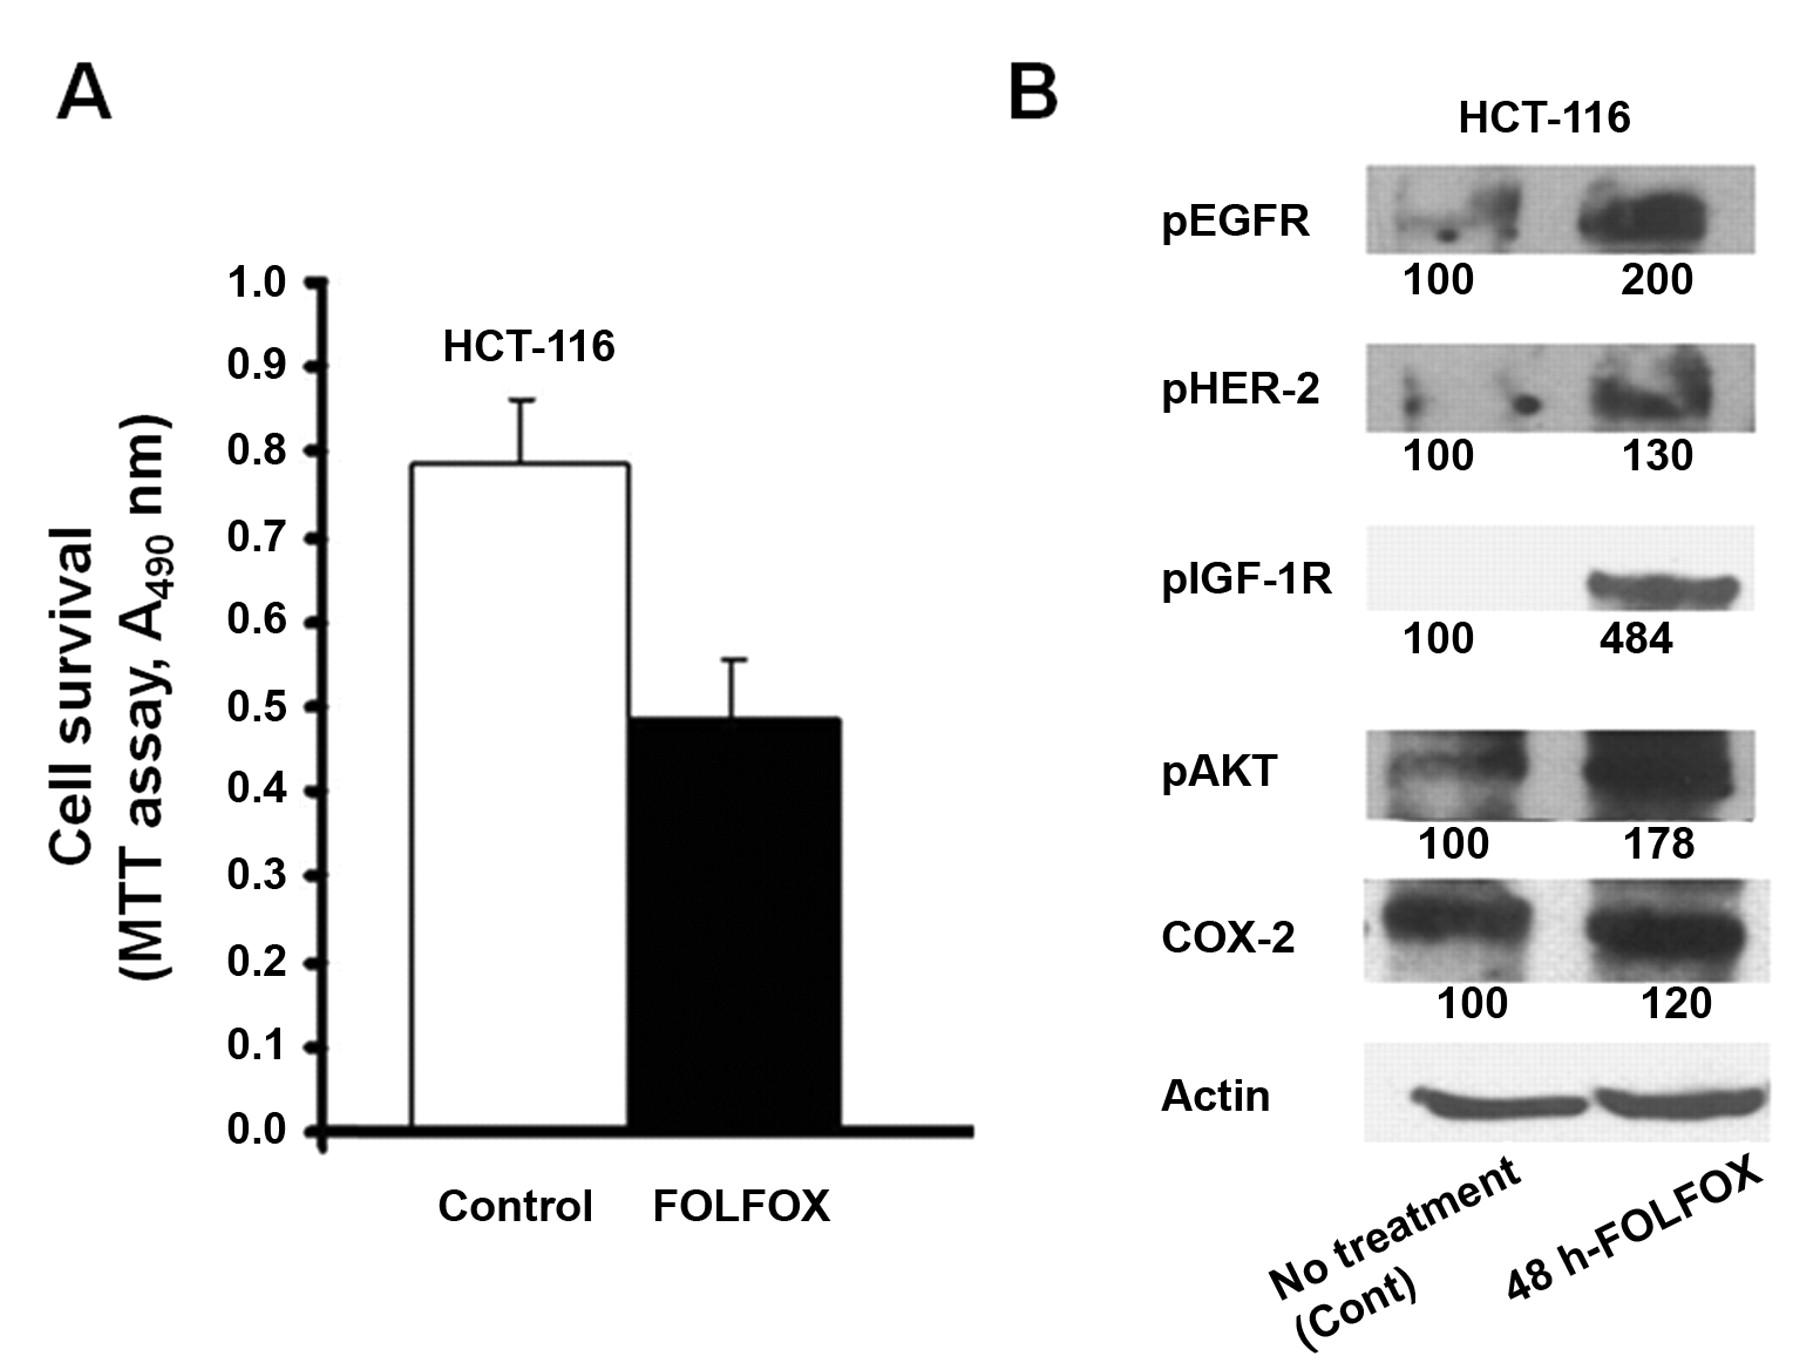 Curcumin Targets Folfox Surviving Colon Cancer Cells Via Inhibition Of Egfrs And Igf 1r